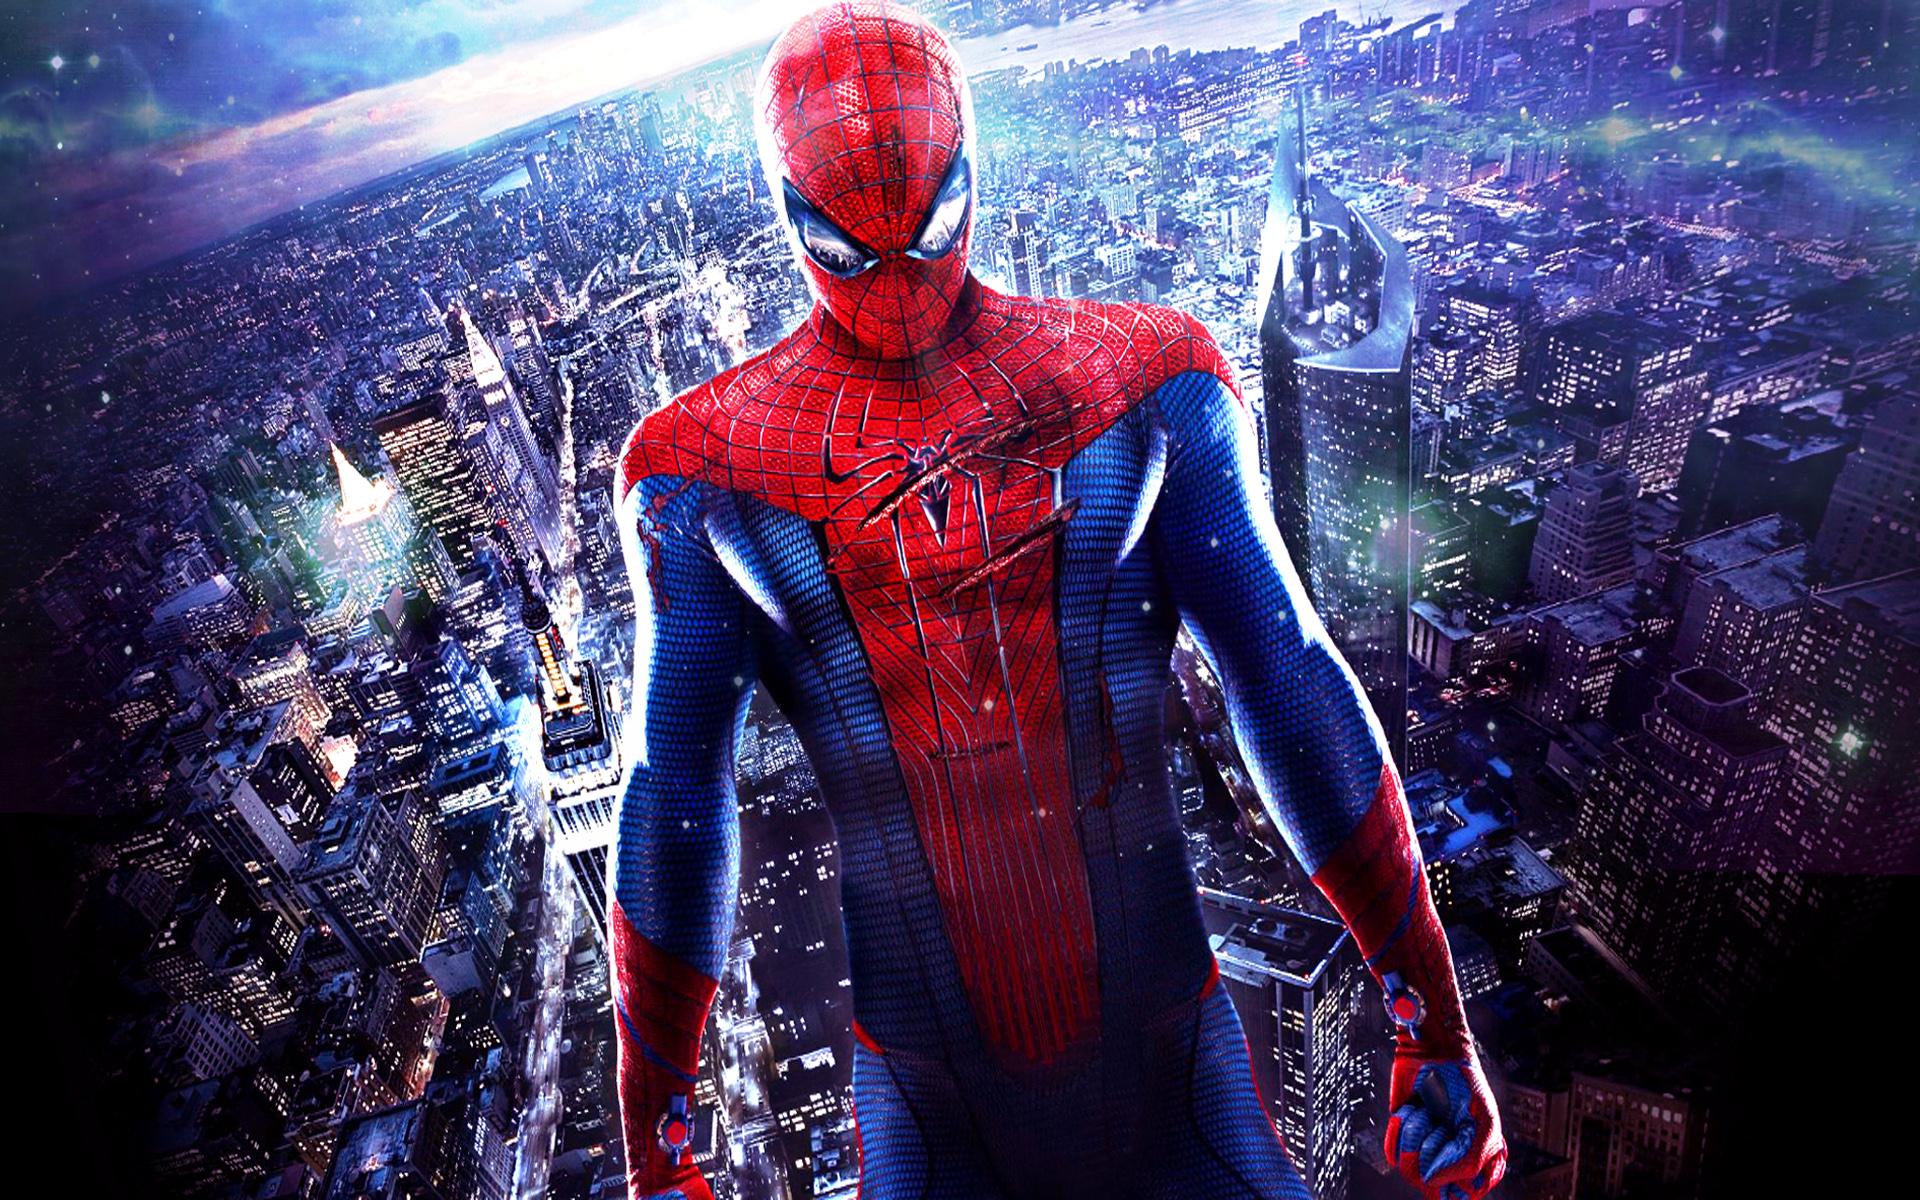 Amazing Spider Man 2 Wallpaper - WallpaperSafari